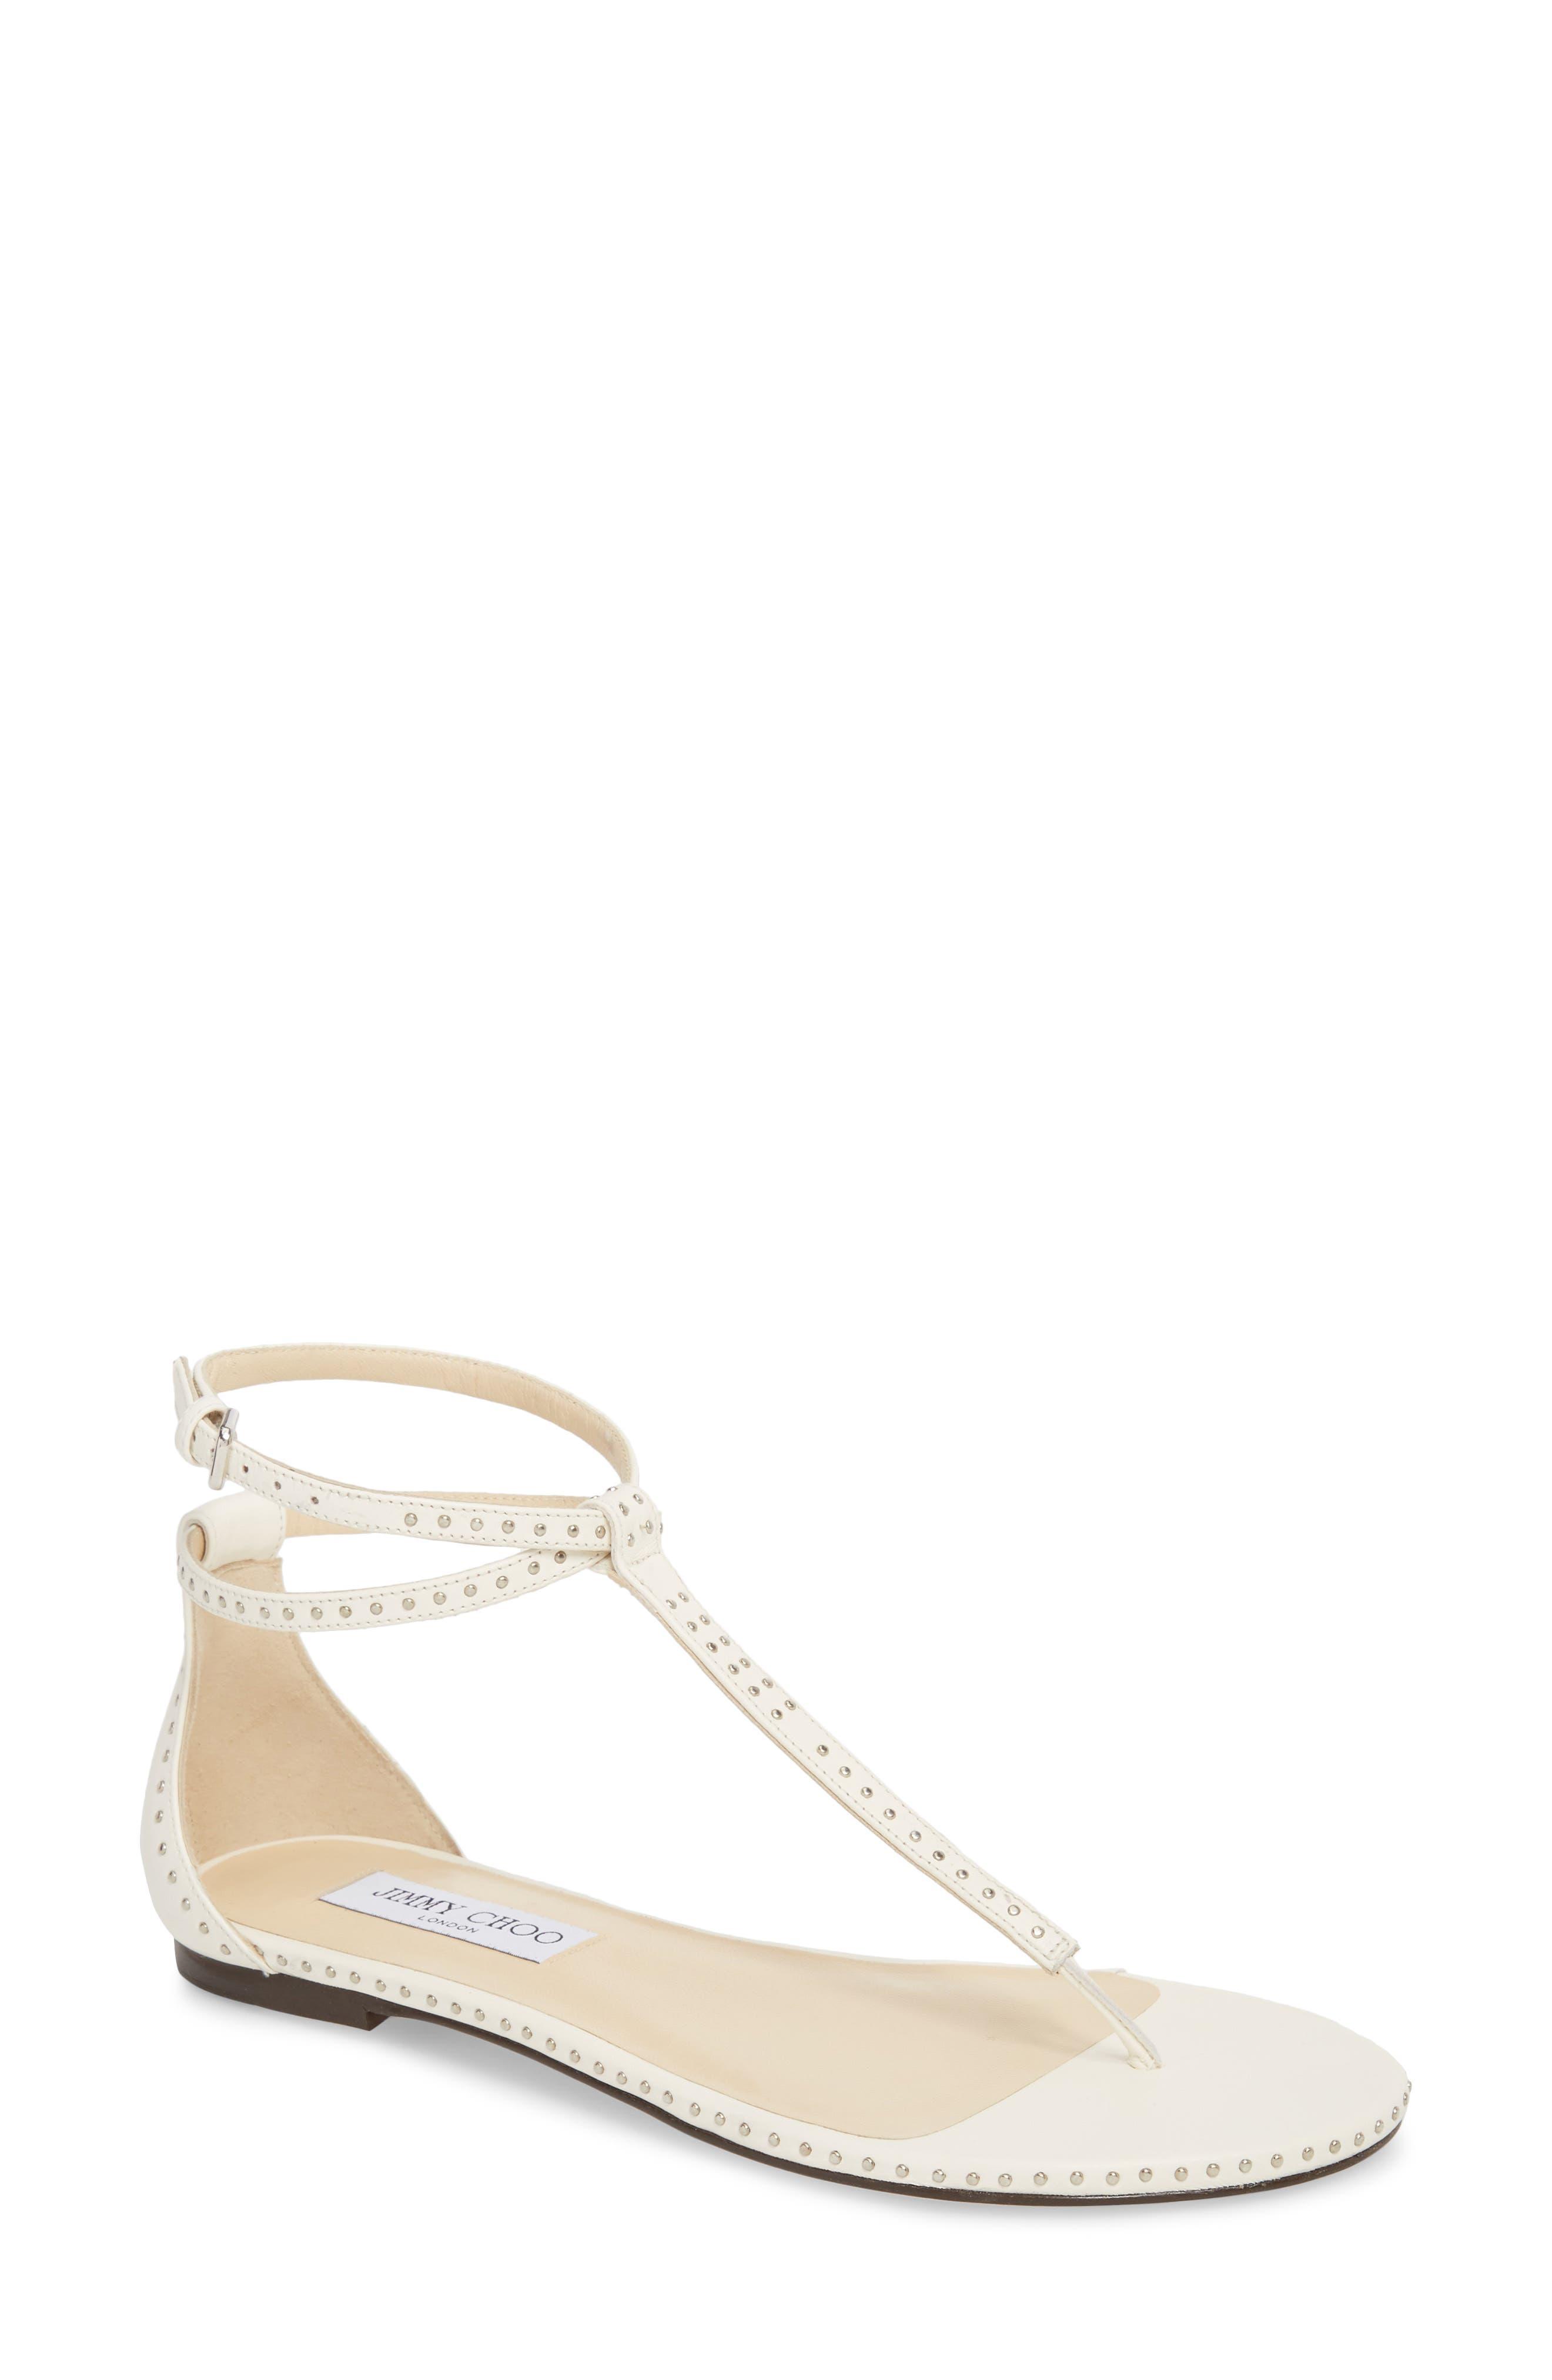 Afia Studded Flat Sandal,                             Main thumbnail 1, color,                             Chalk